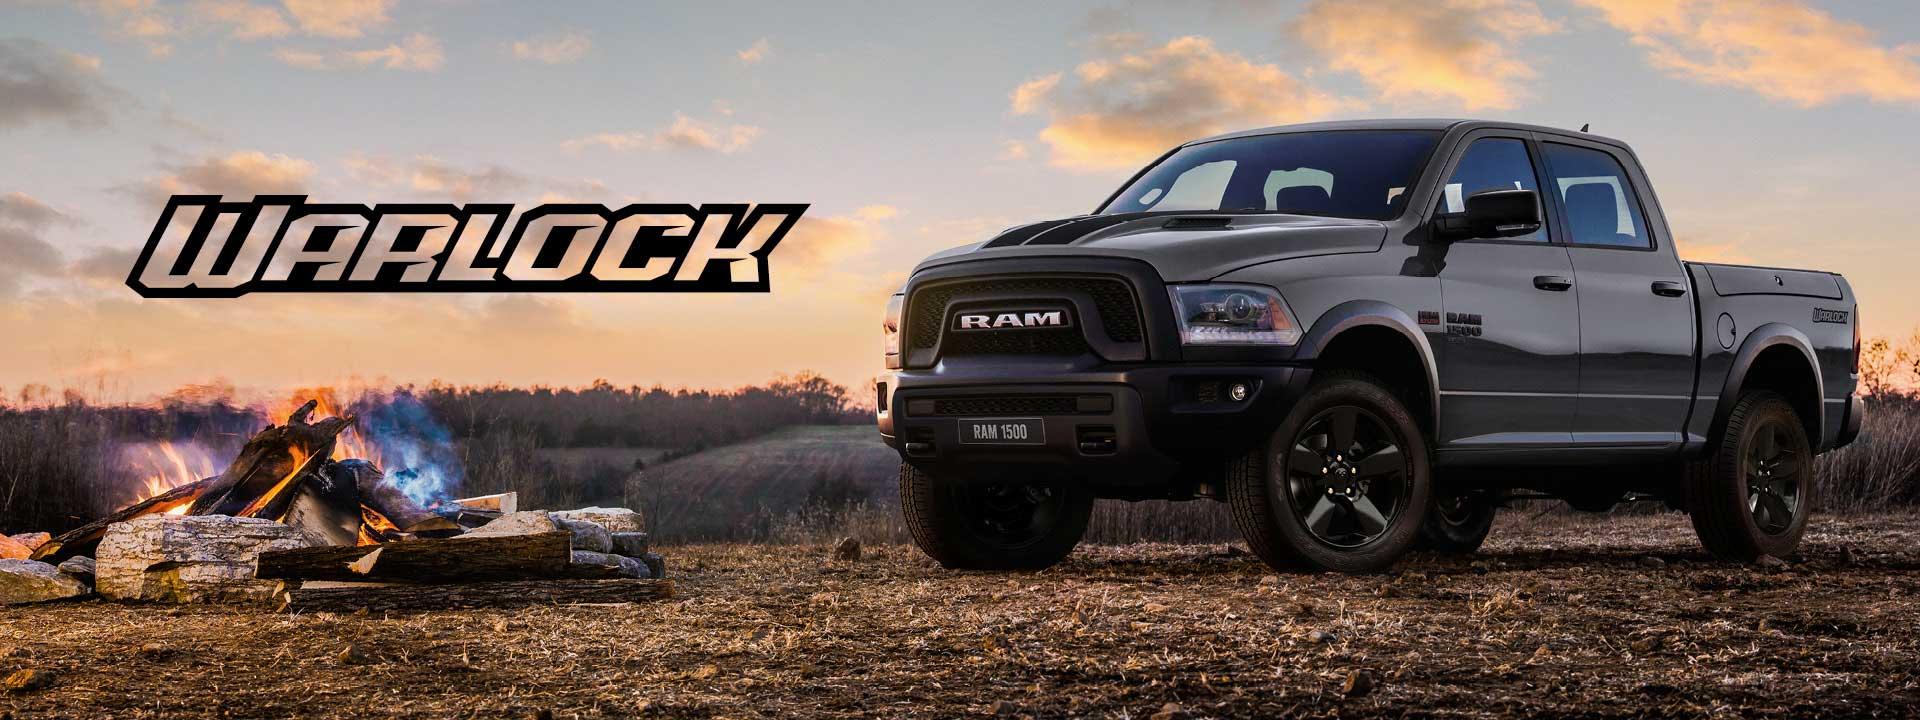 RAM 1500 WarlockRam 1500 Warlock |Australia's Toughest 4x4 Pickup Truck |Eats Utes for Breakfast |V8 Hemi |Ram Trucks Australia